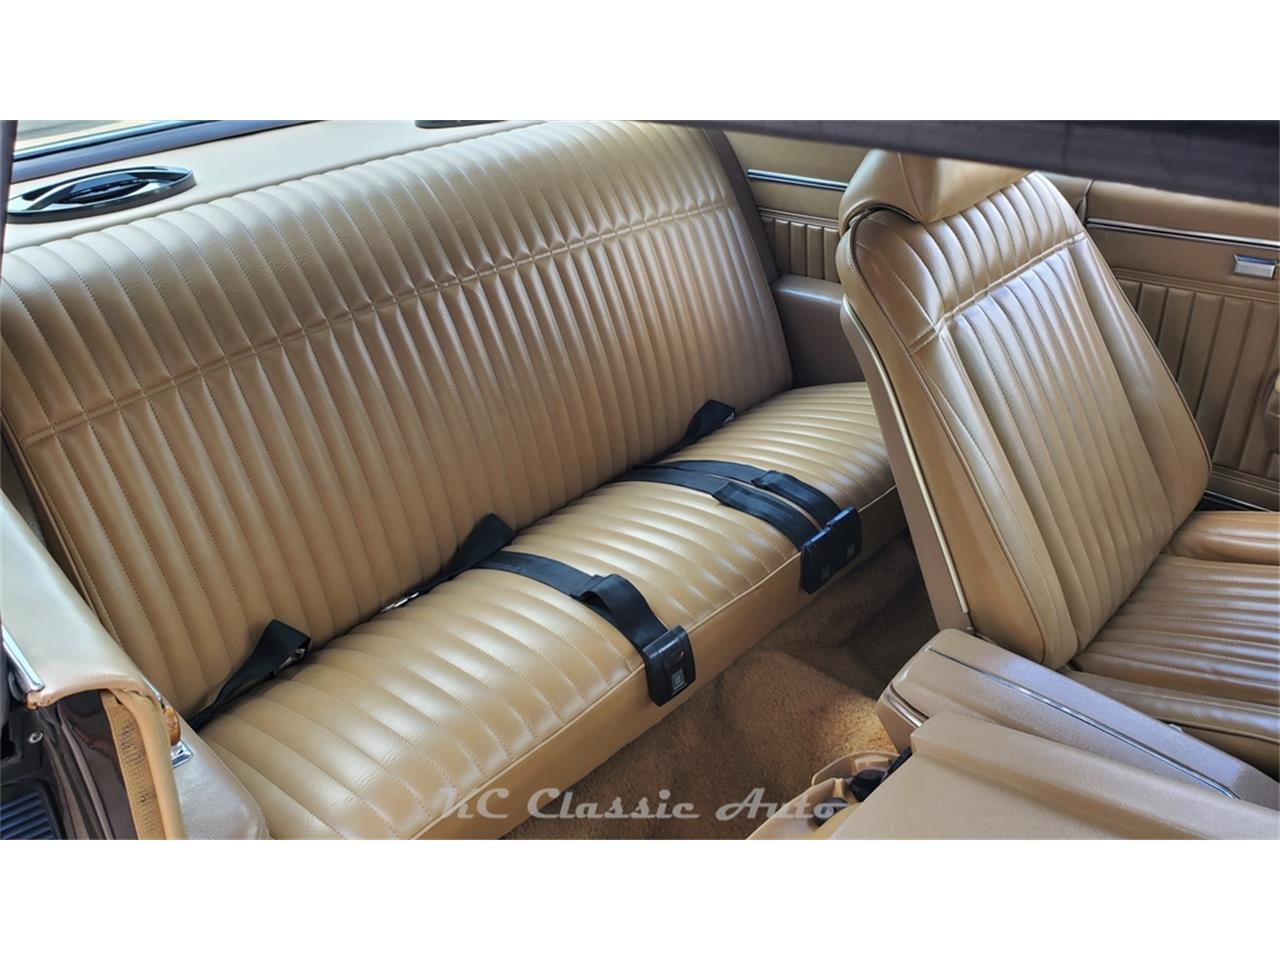 1970 Chevrolet Monte Carlo (CC-1412261) for sale in Lenexa, Kansas